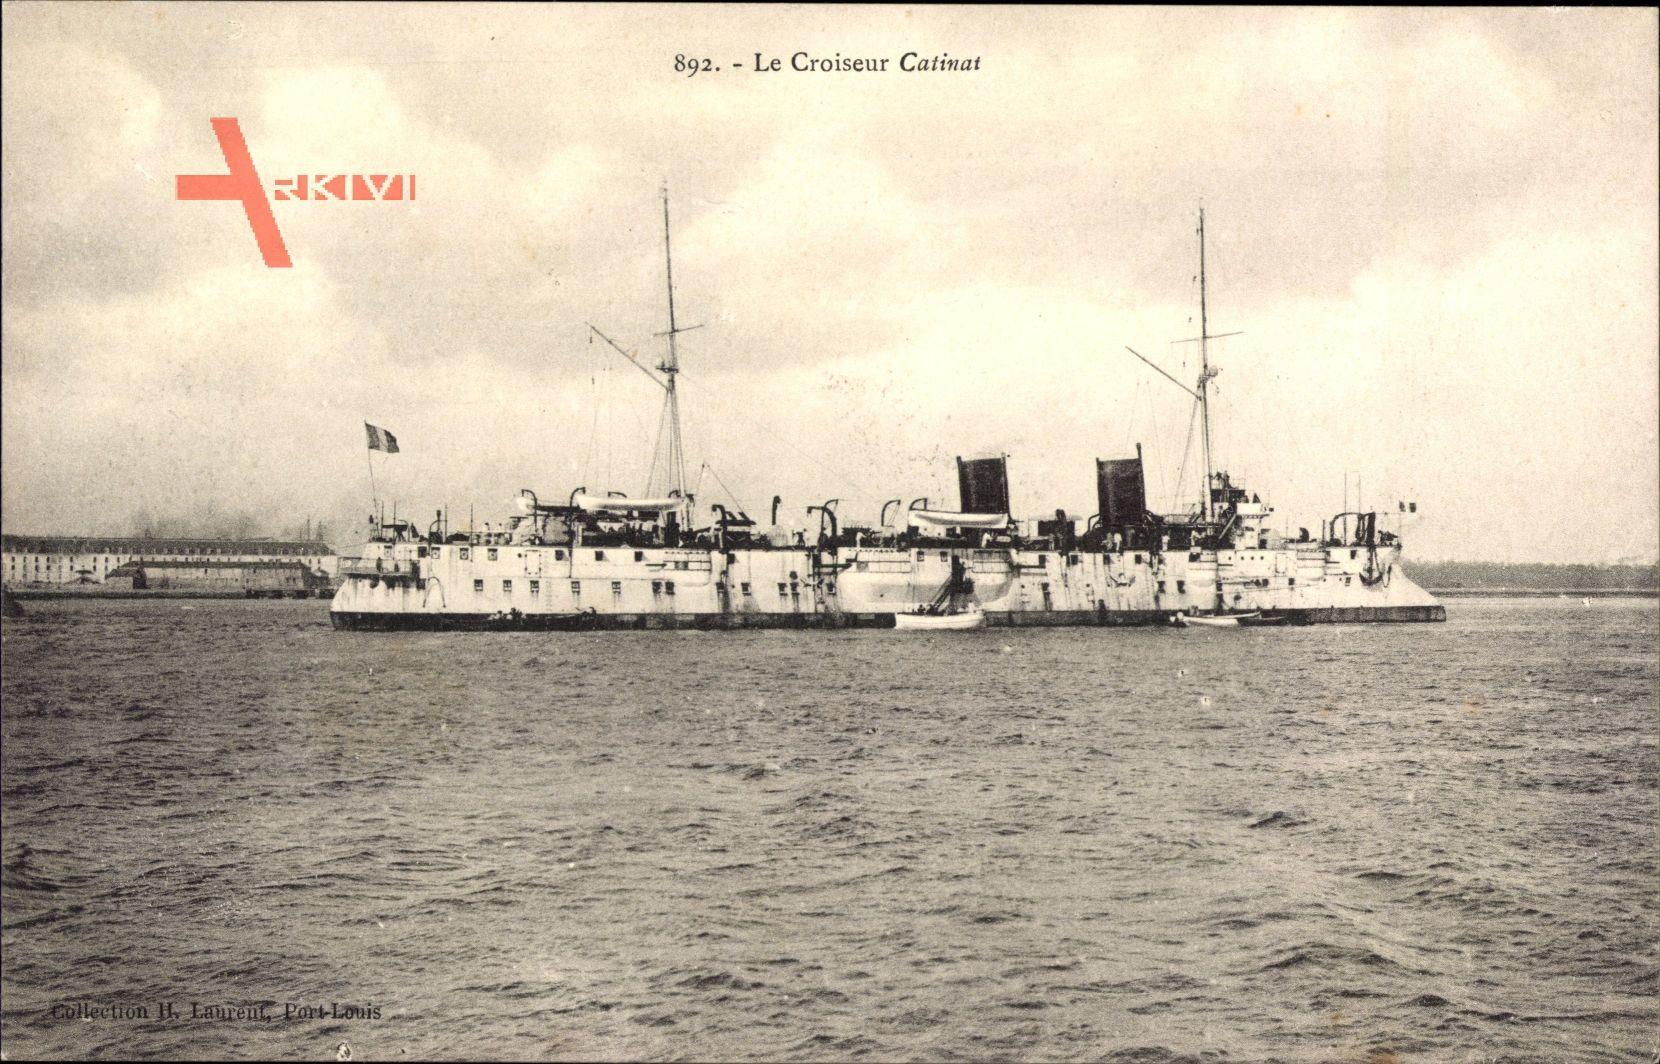 Französisches Kriegsschiff, Le Croiseur Catinat, Kreuzer